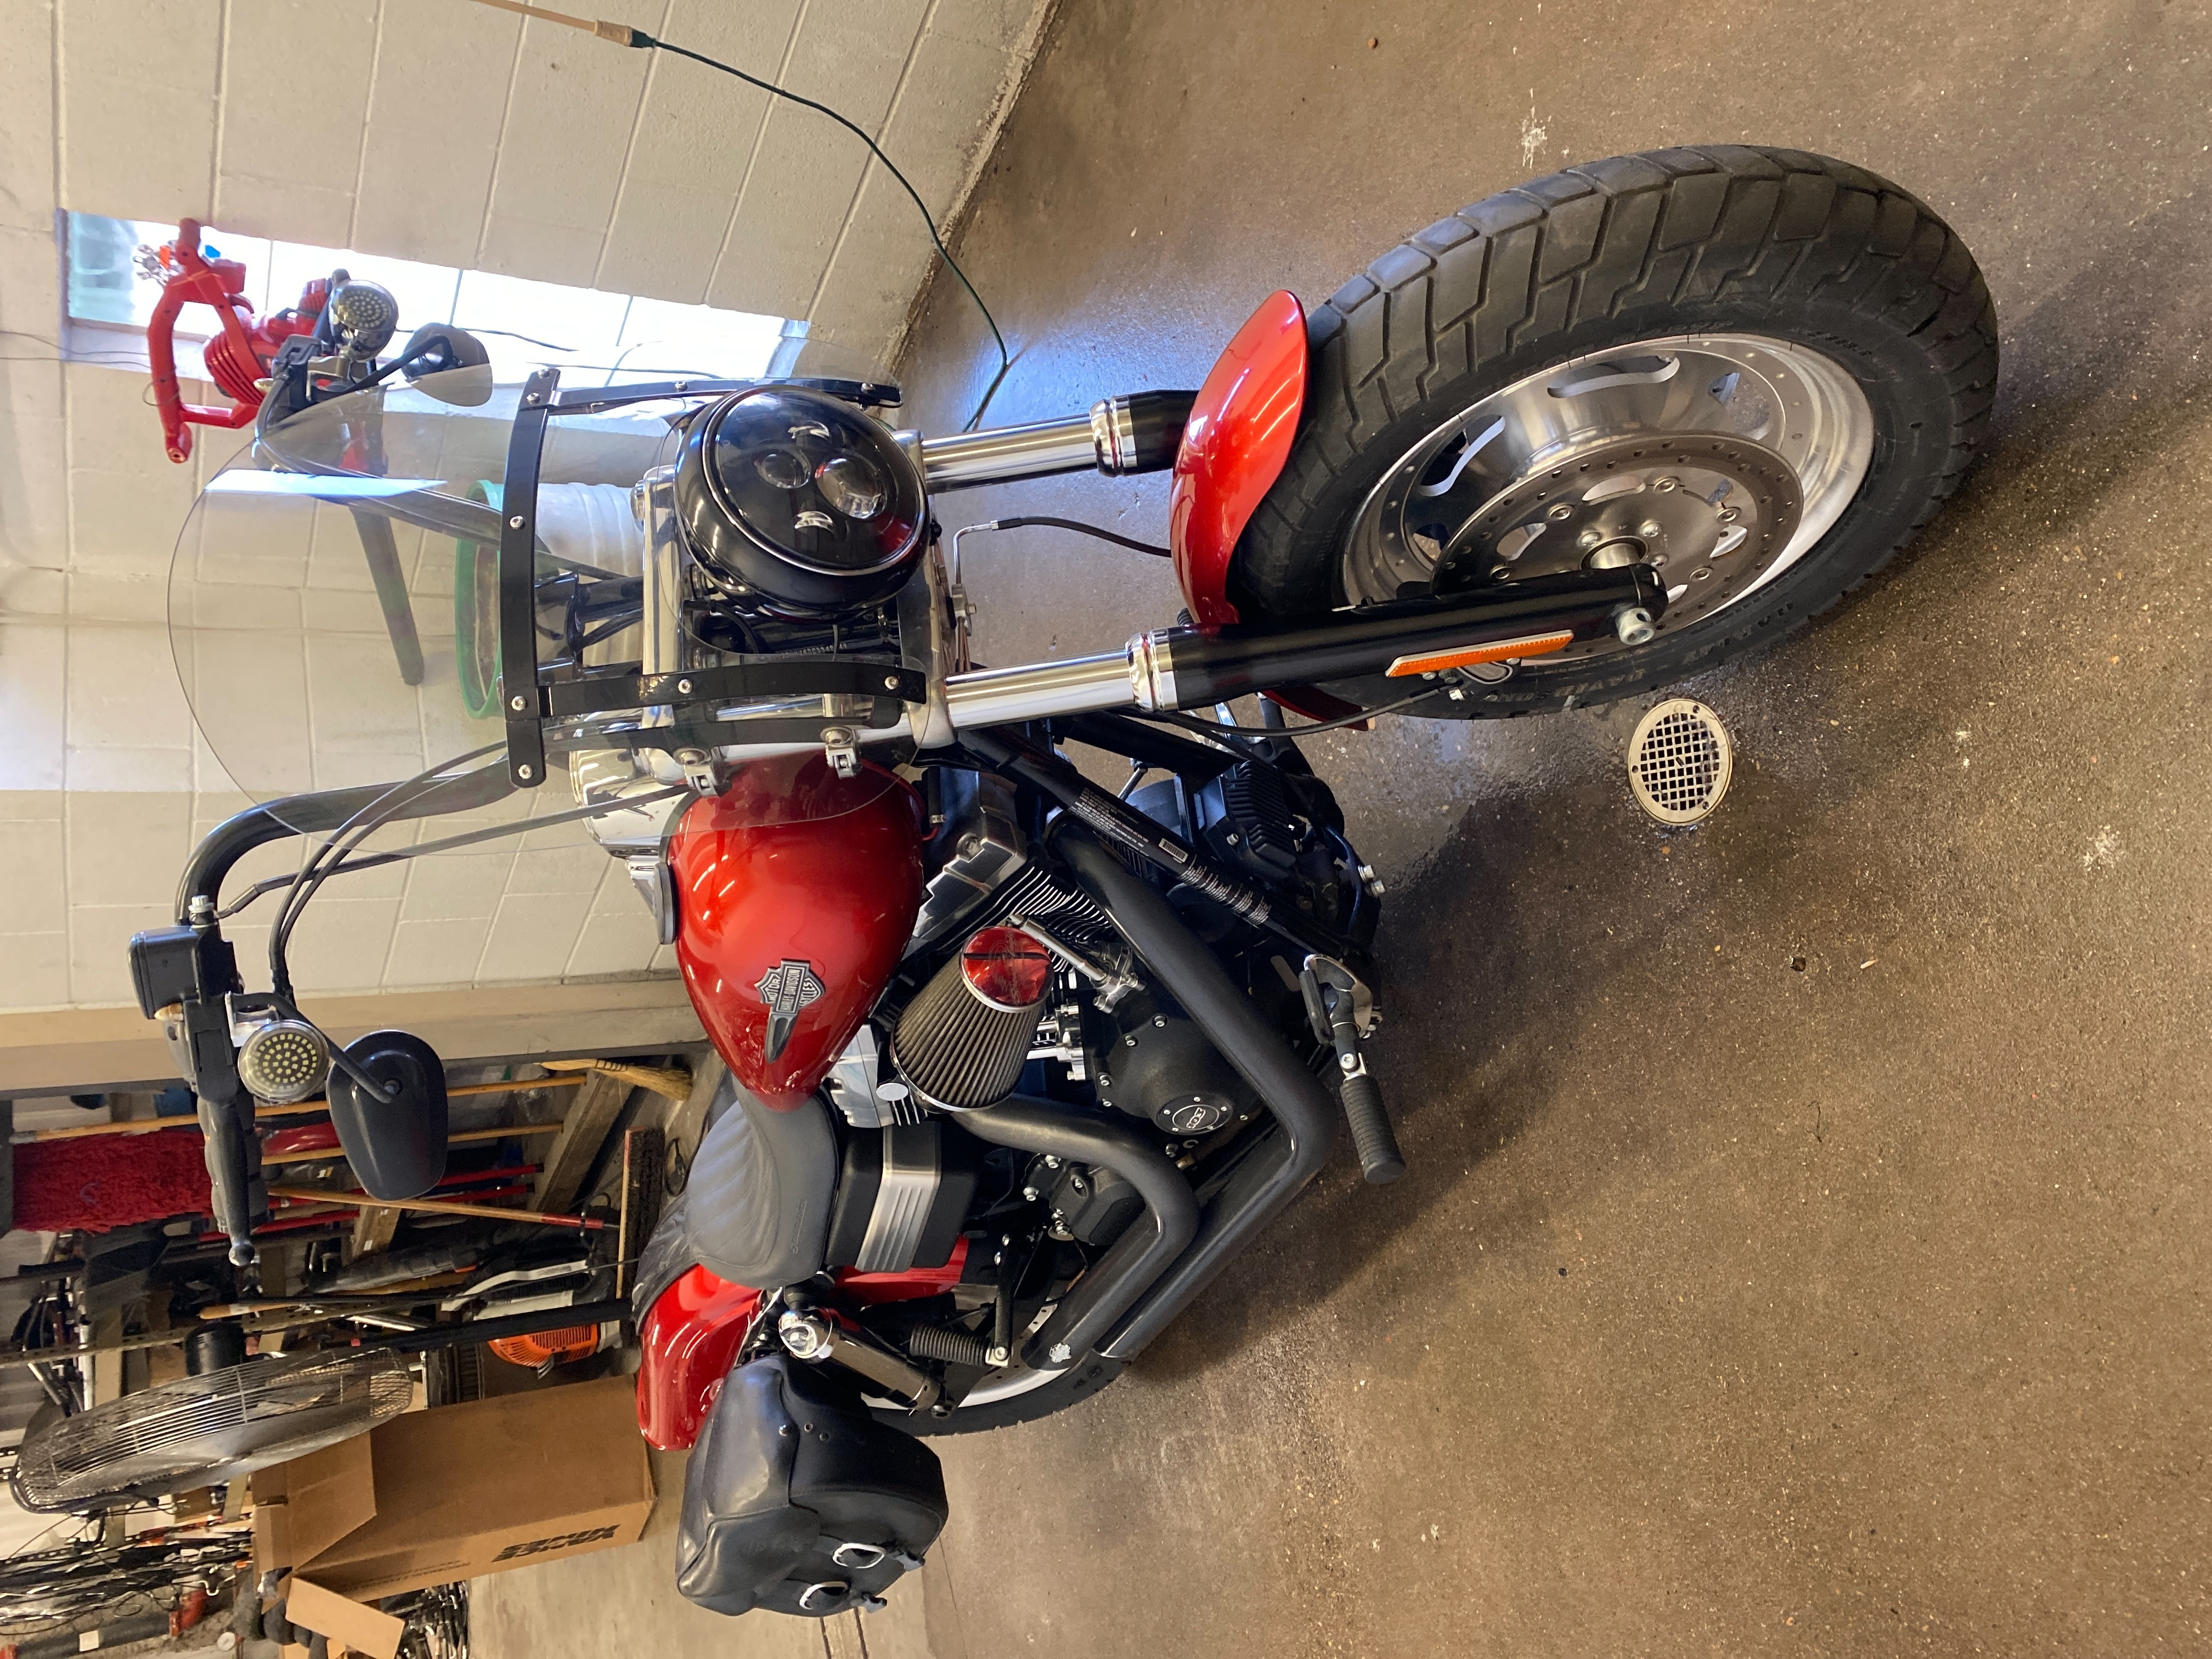 2013 Harley-Davidson Dyna Fat Bob at Outpost Harley-Davidson